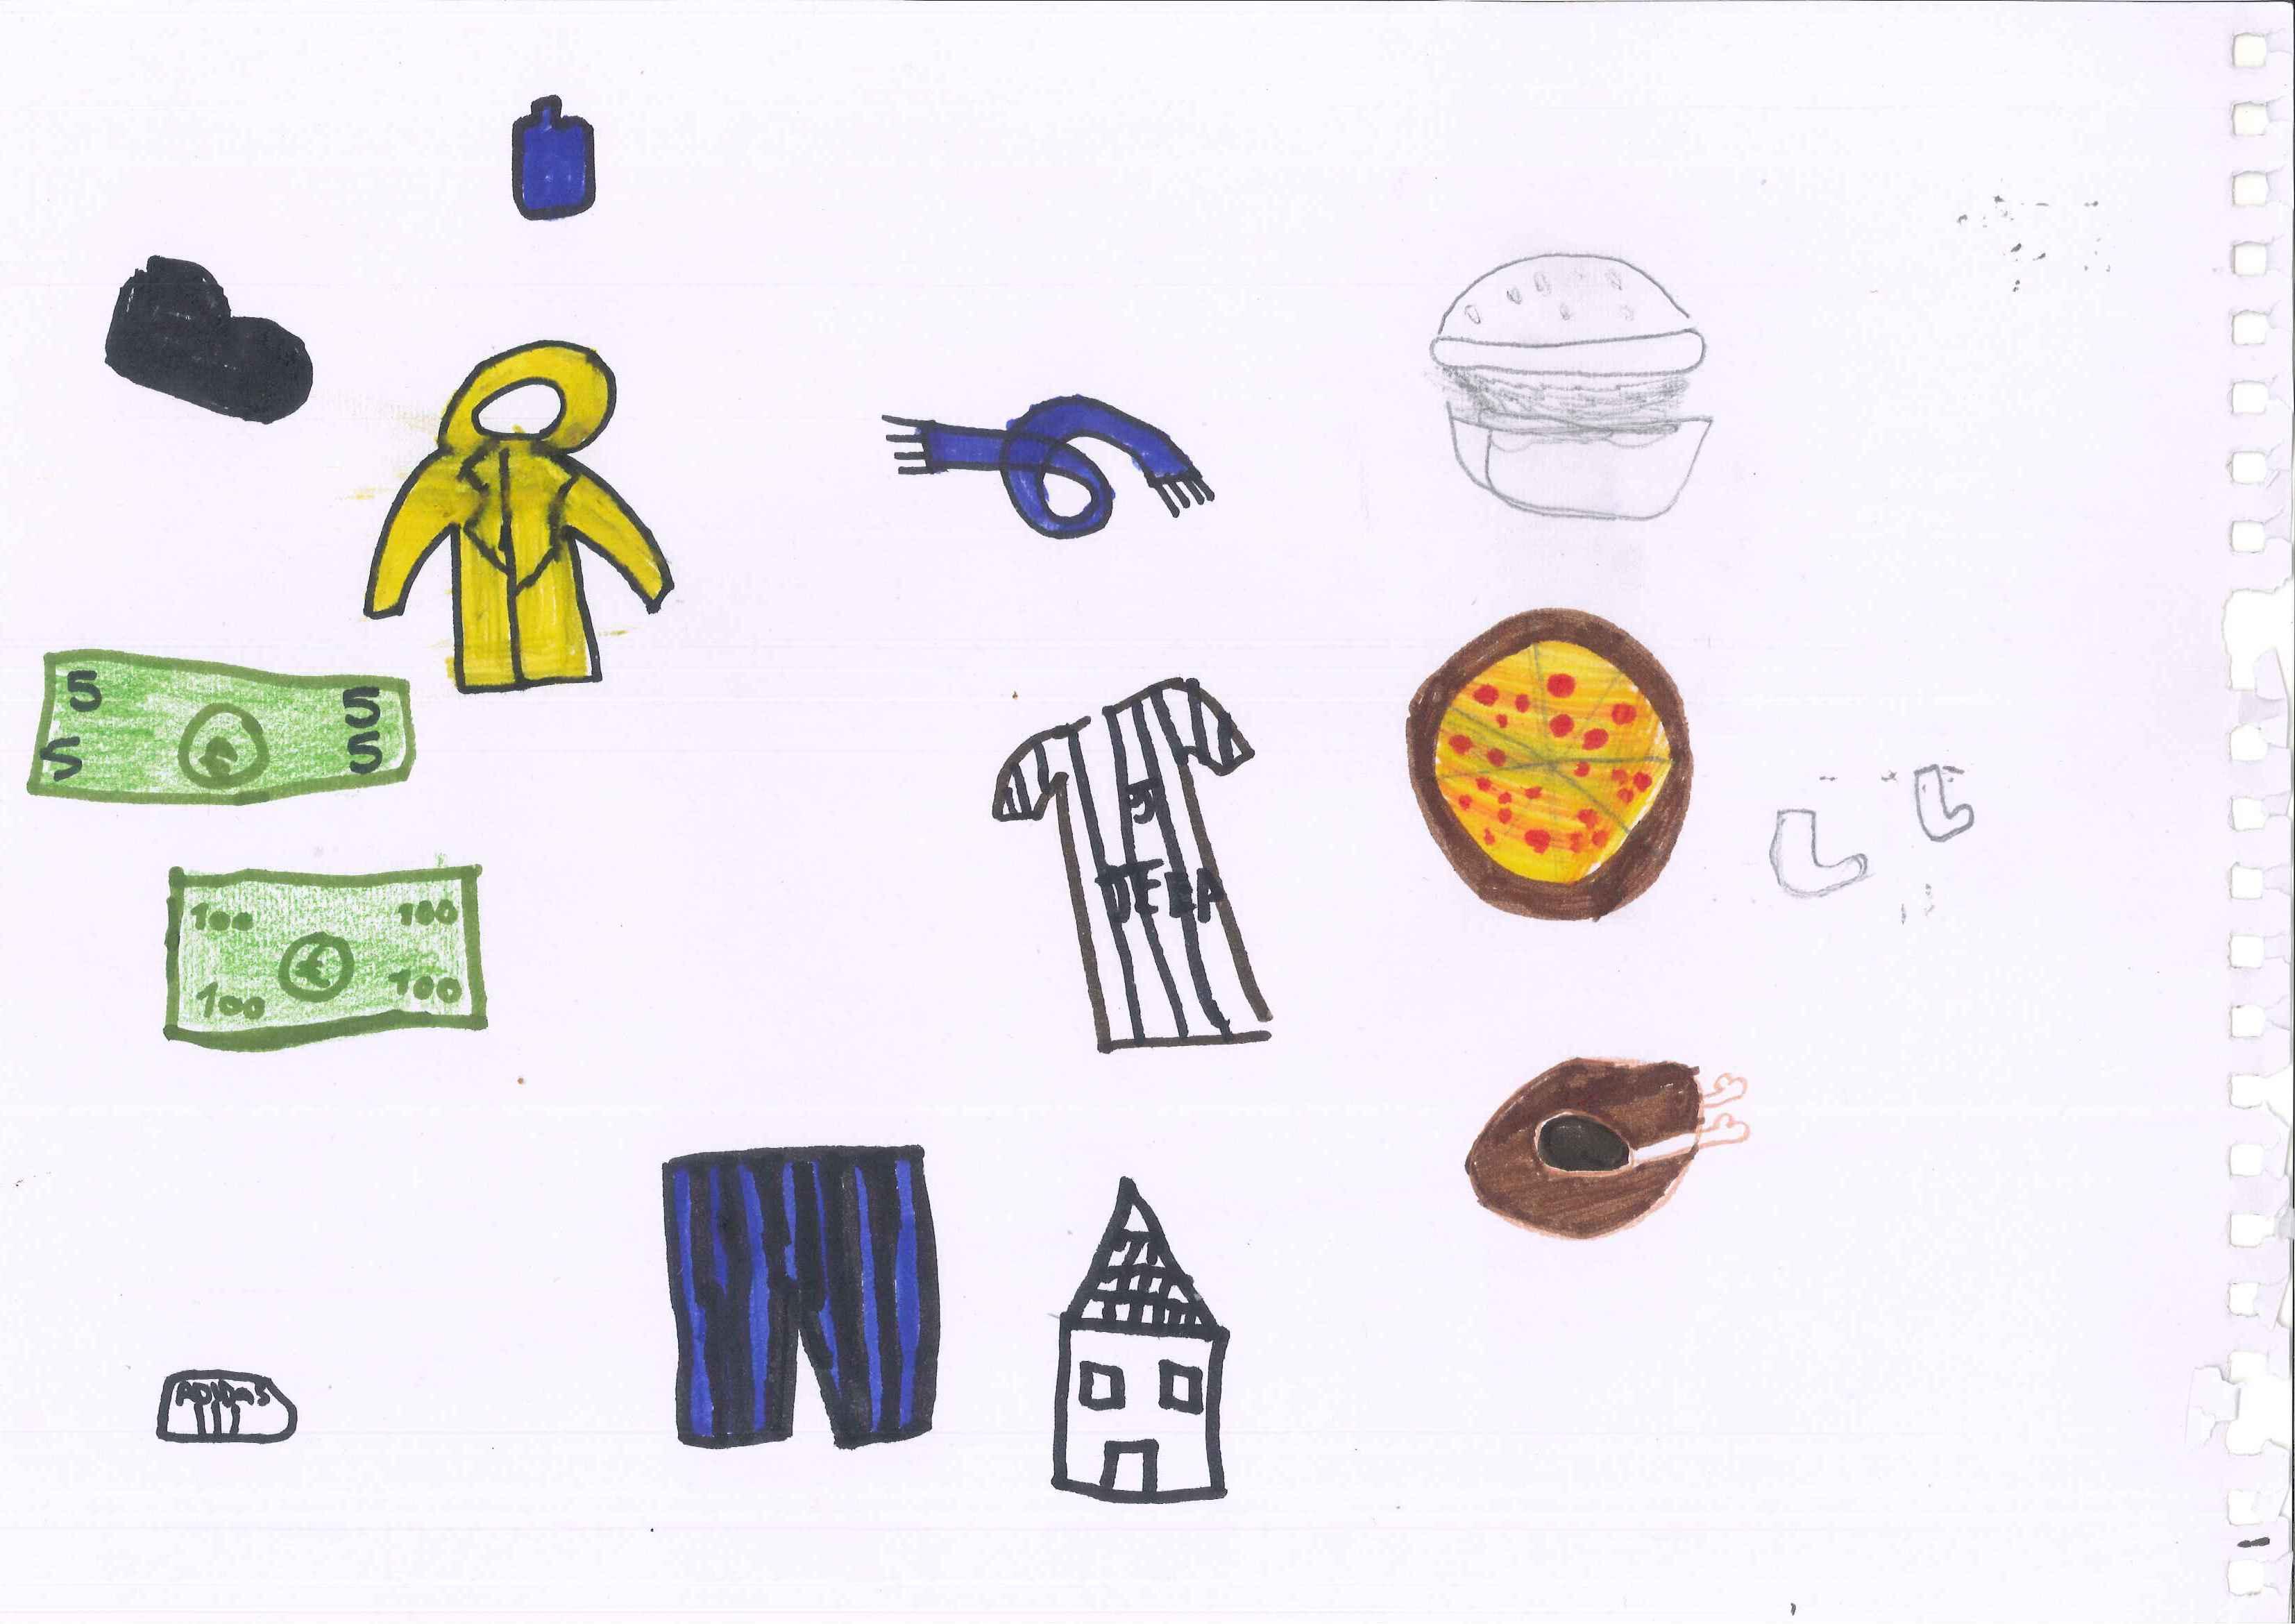 Disegni bimbi colori_Pagina_07